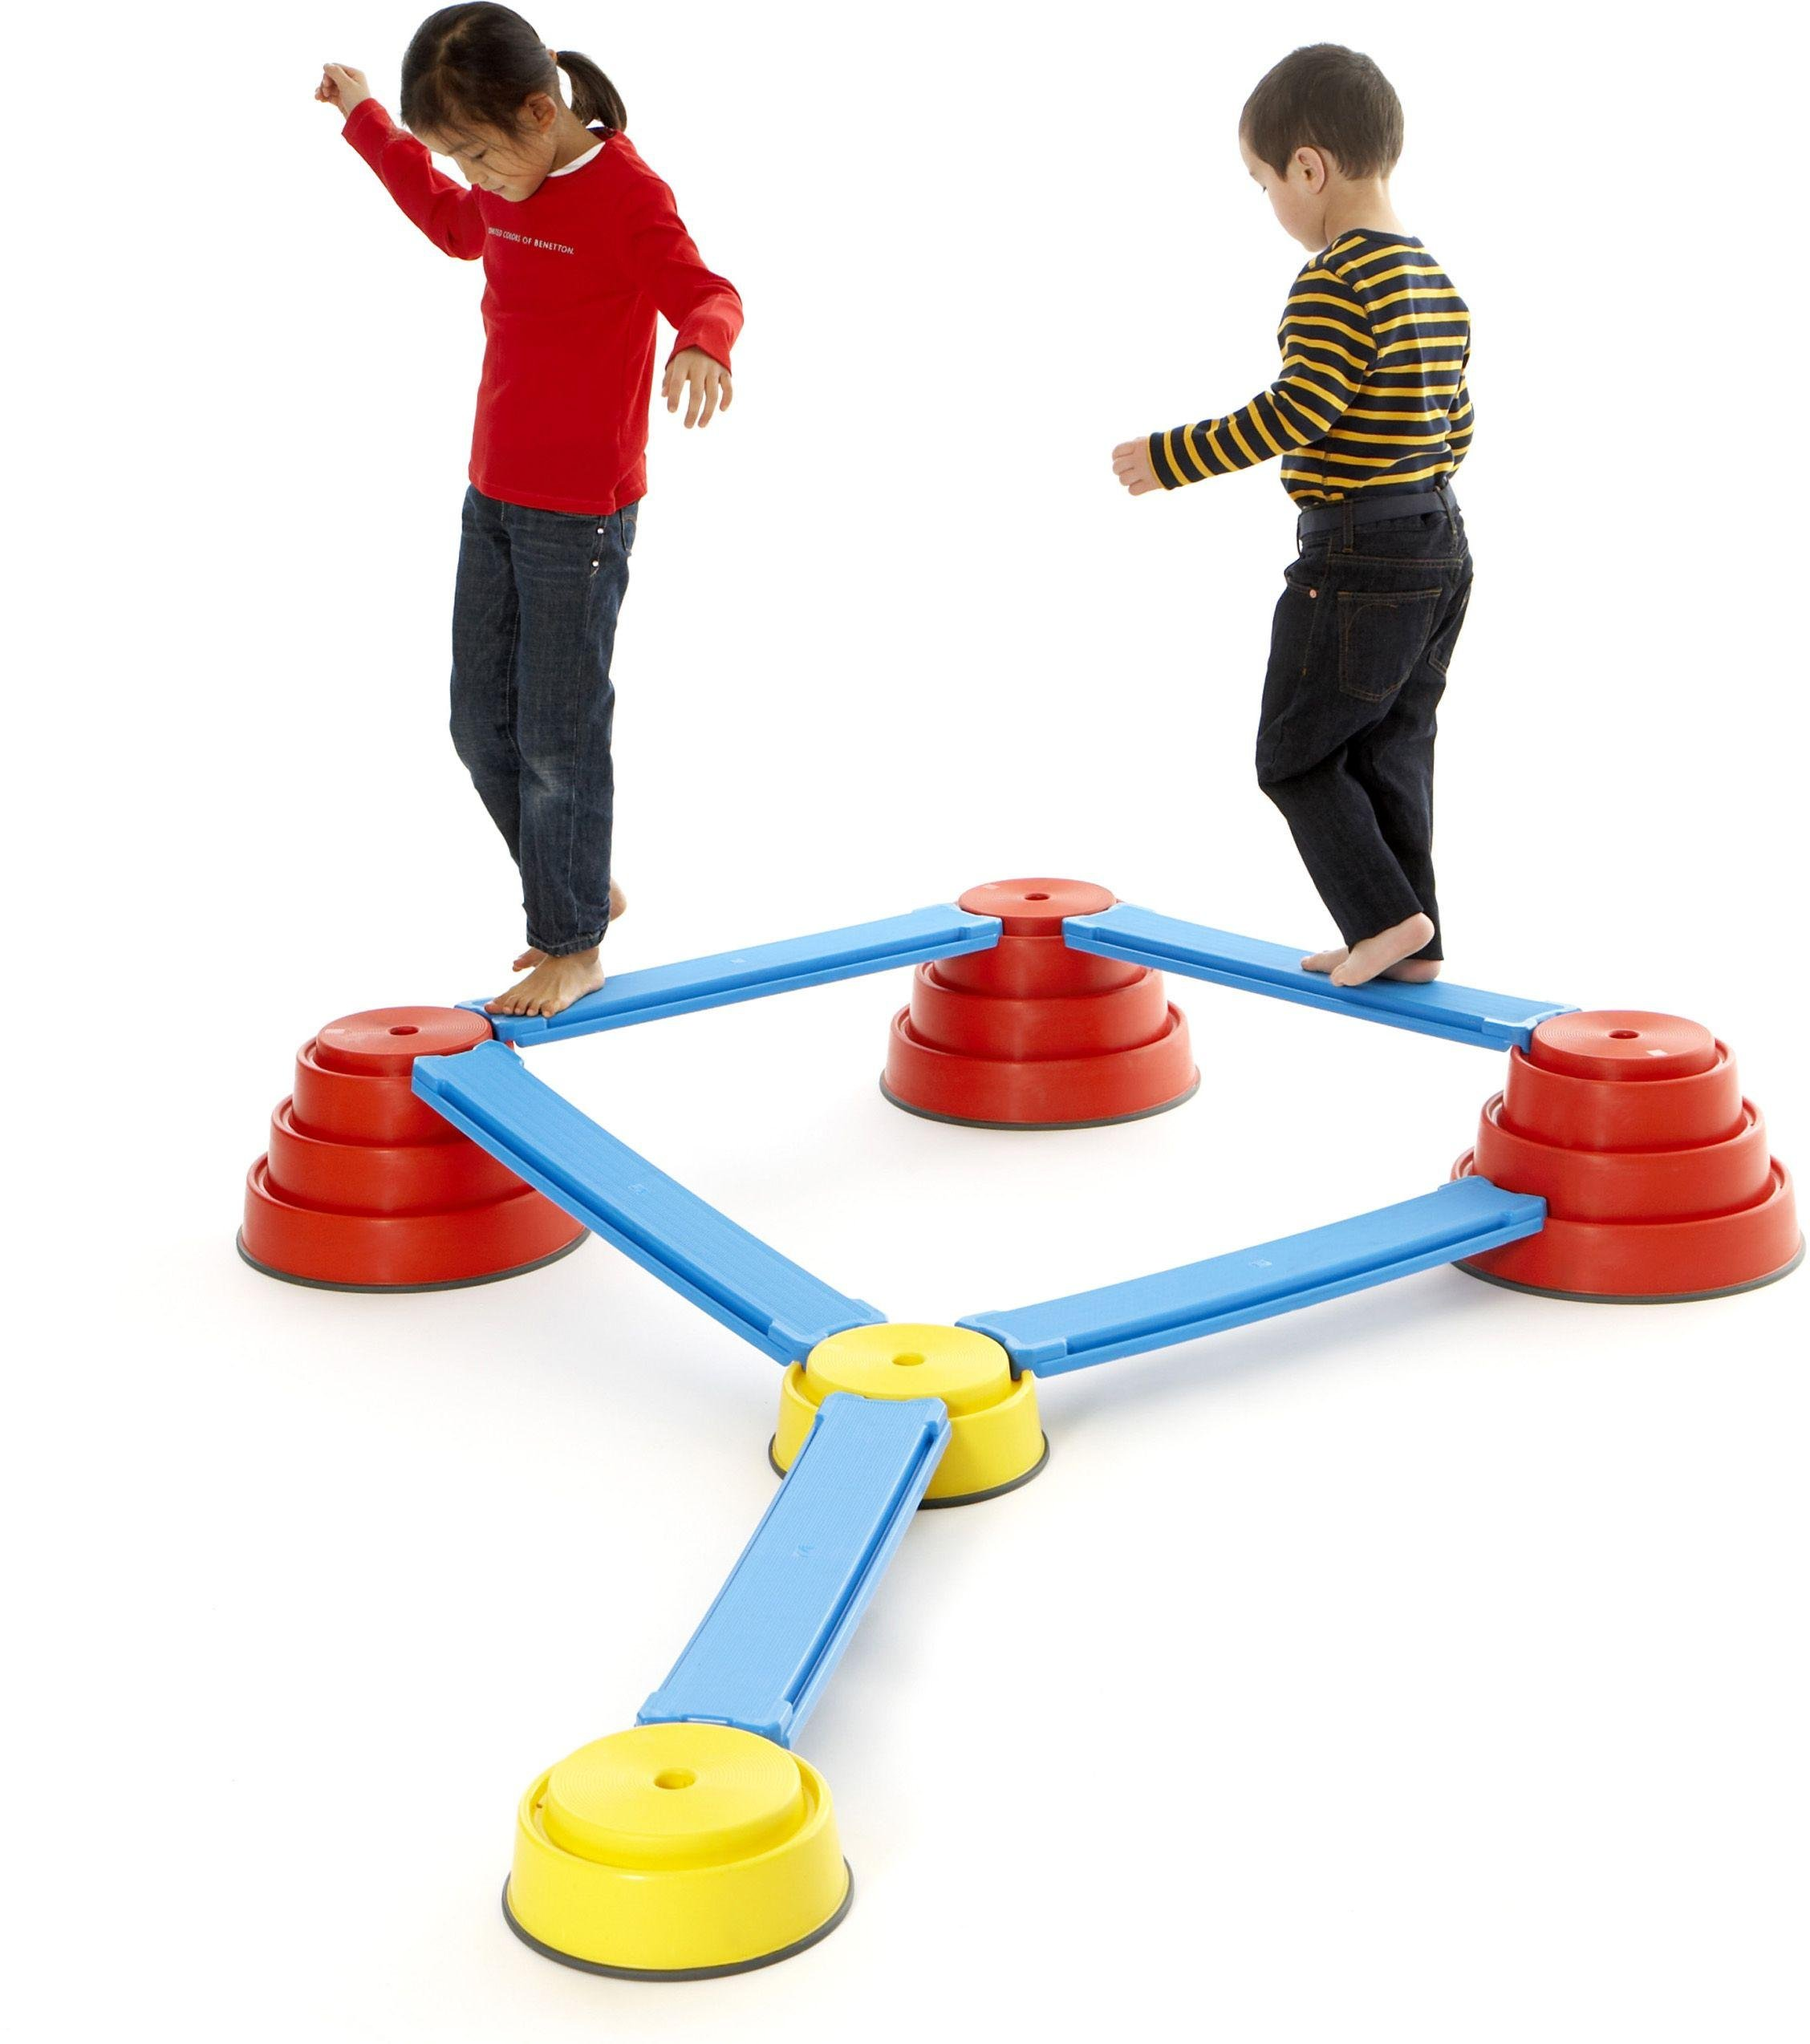 Image of Gonge Build and Balance Course Set